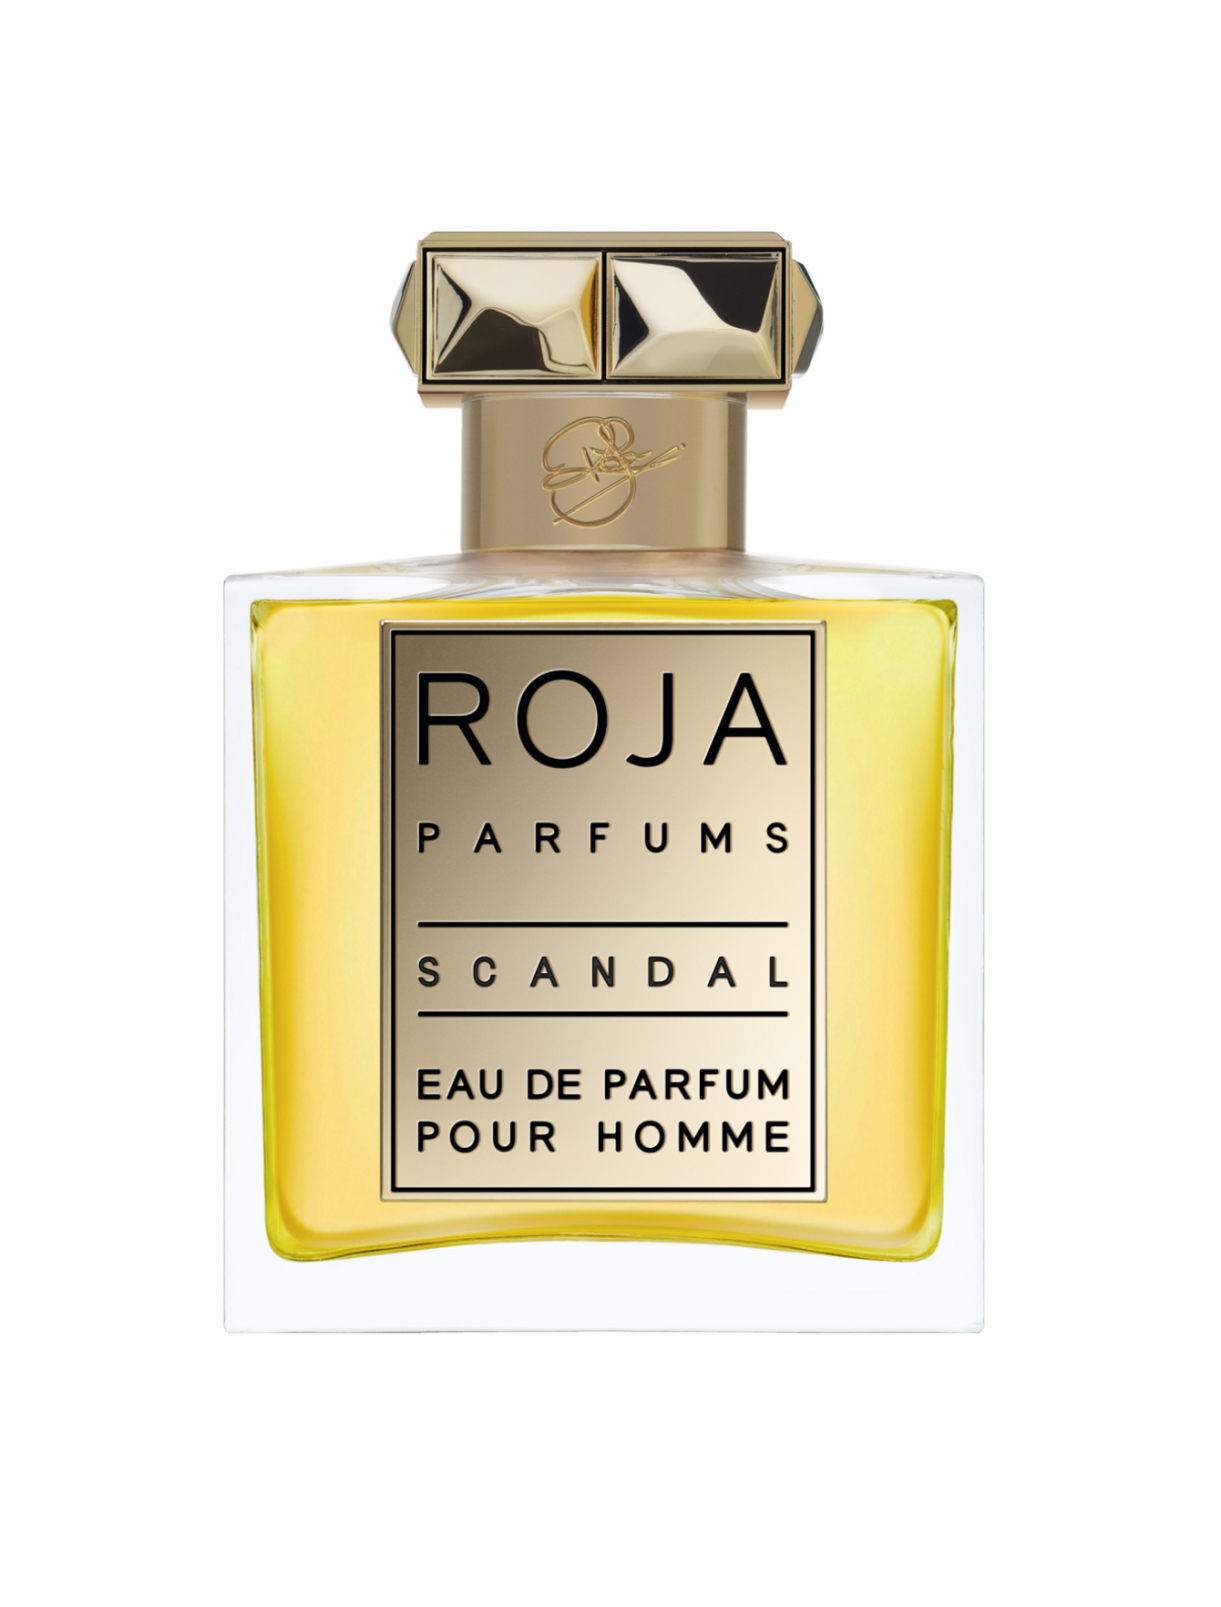 Парфюмерная вода 50 мл Scandal Pour Homme Roja Parfums  –  Общий вид